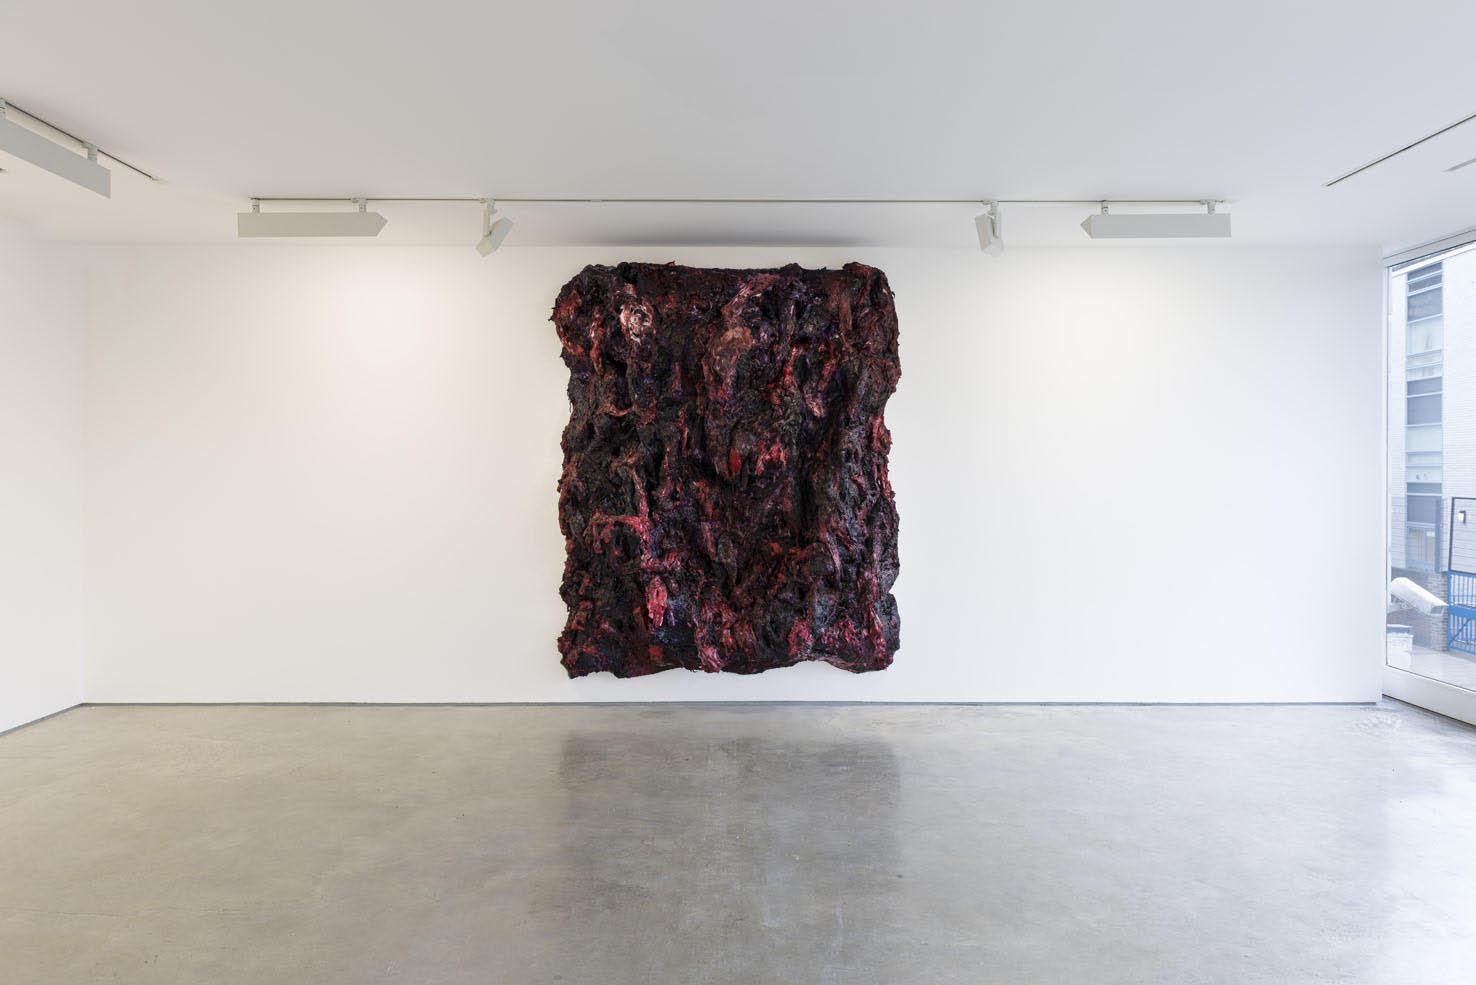 Anish Kapoor <em>Shedding</em>, 2014. Silicone and pigment 235 x 199 x 65 cm © the artist; Courtesy, Lisson Gallery, London (image ref #: KAPO150013)